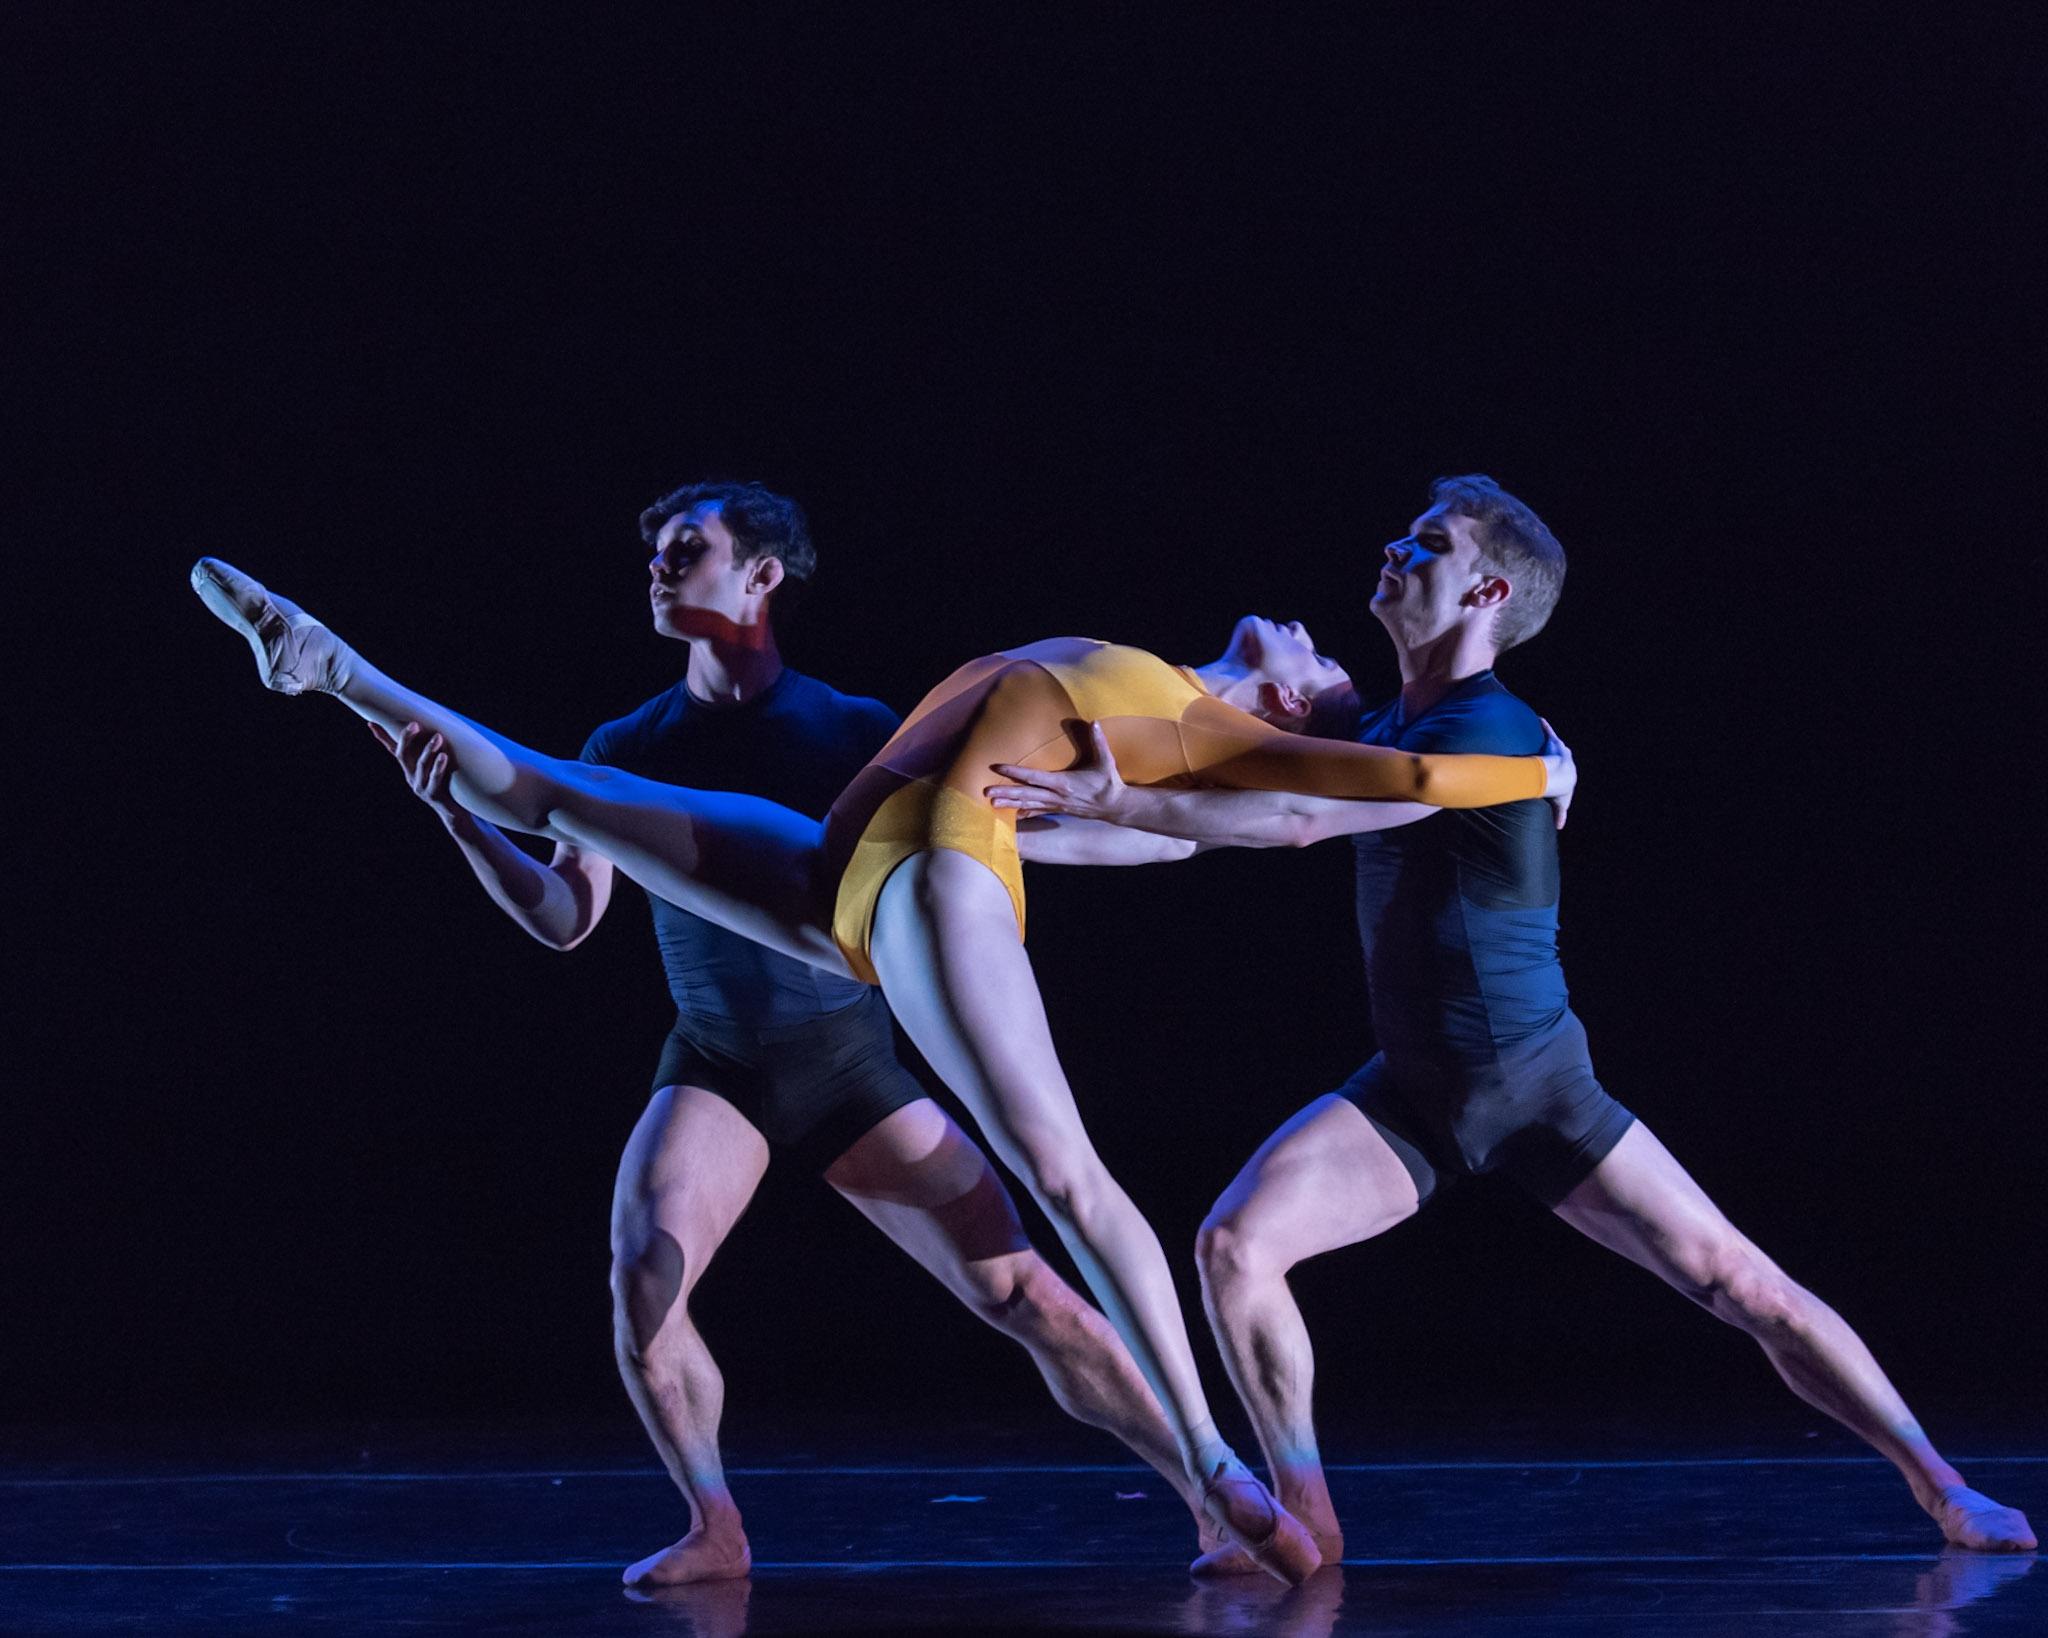 Chicago Repertory Ballet's Michelle Meltzer, Marco Clemente, Django Allegretti (Photo by Topher Alexander)